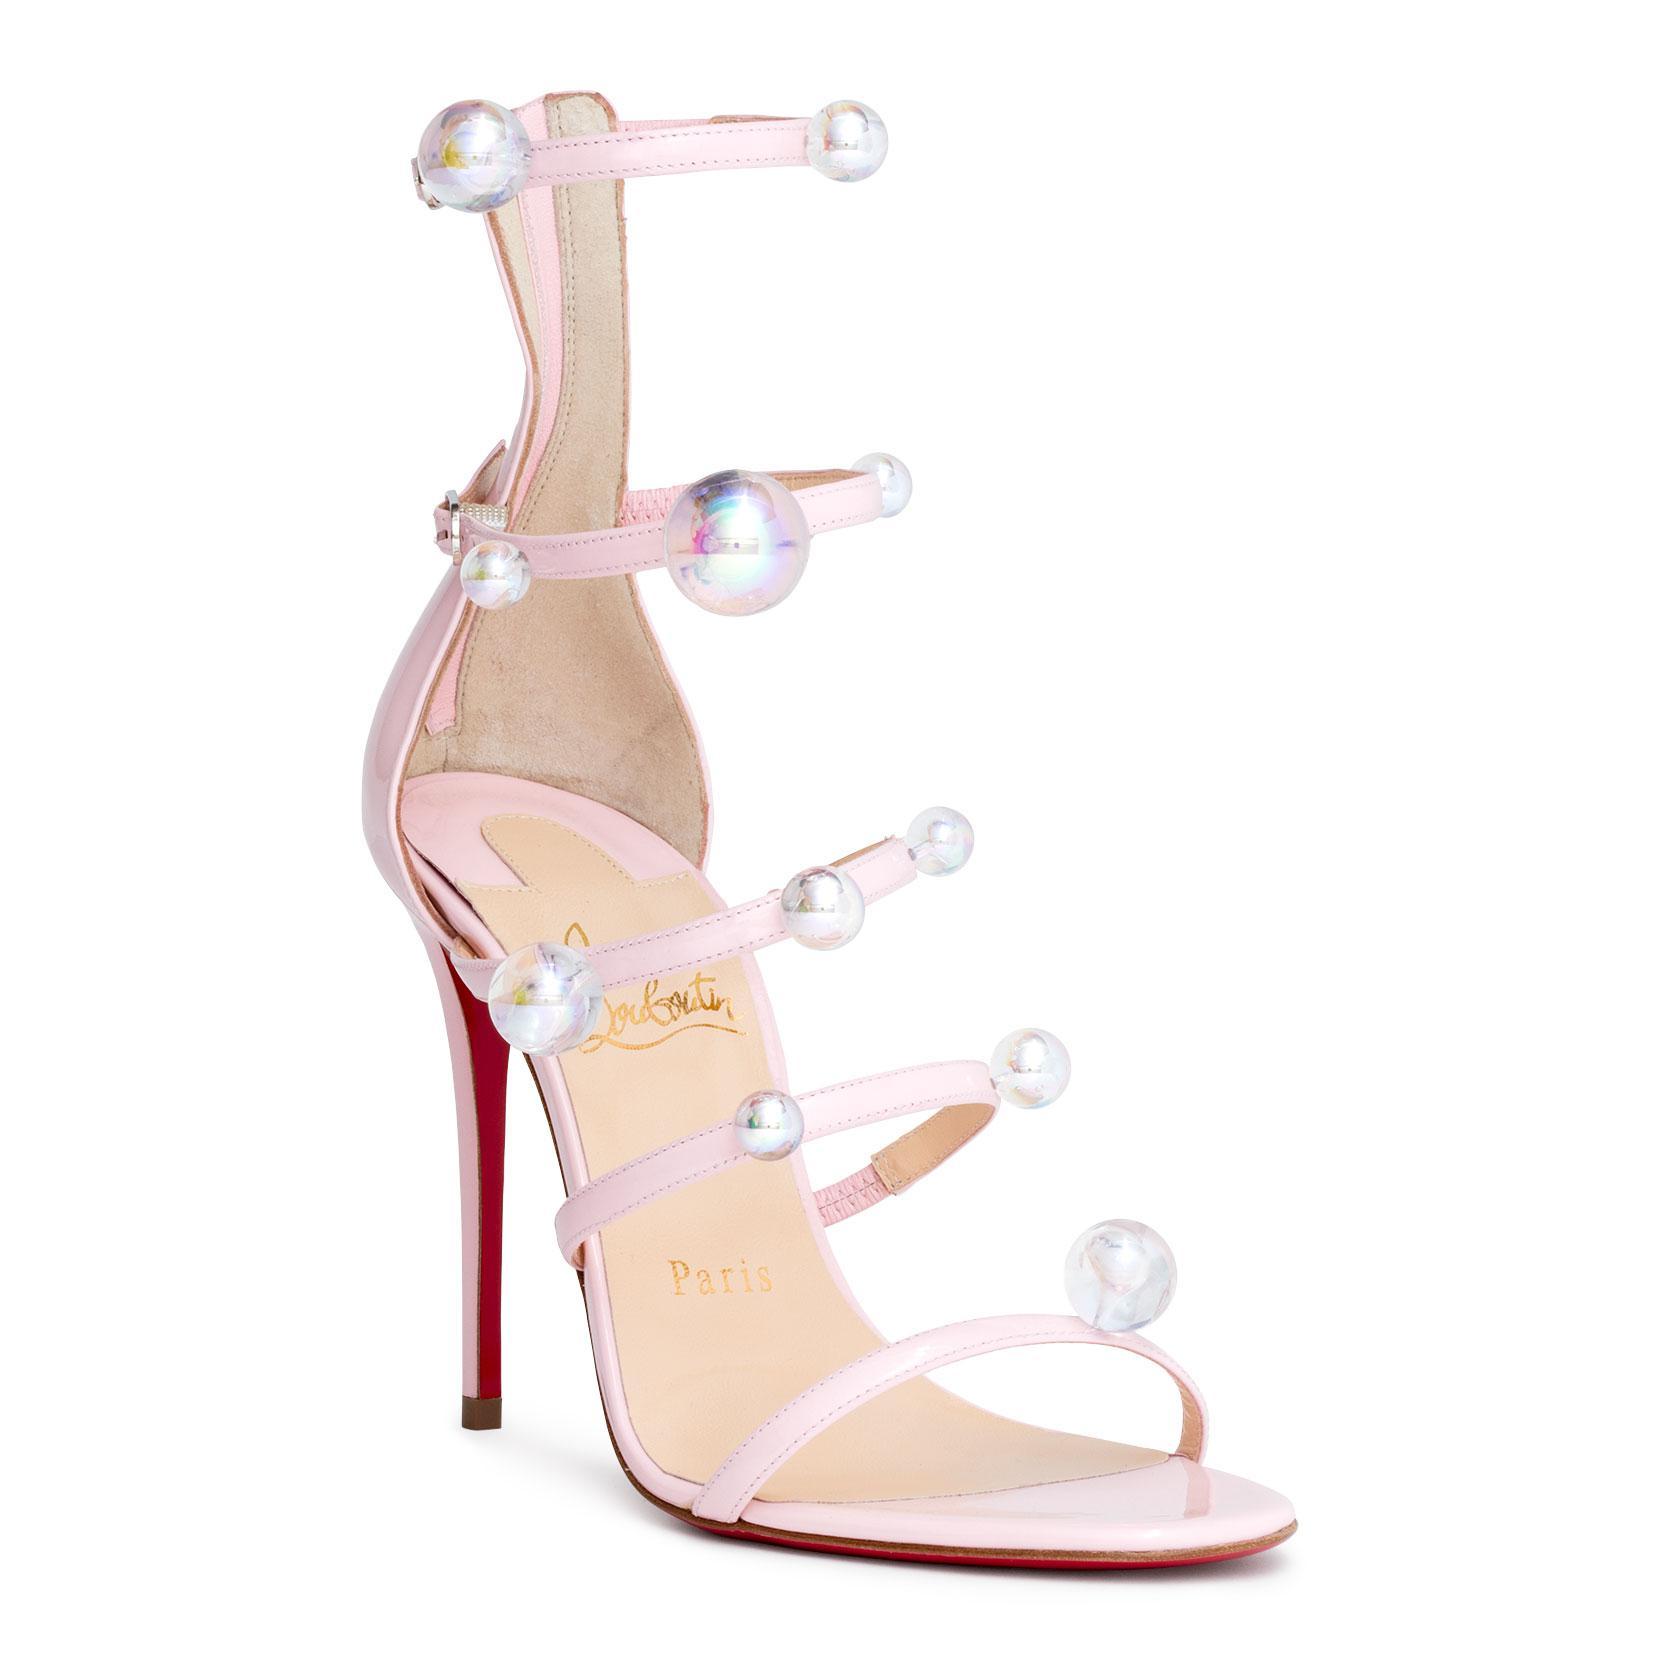 Atonana 100 patent leather sandals Christian Louboutin 0vDexcp